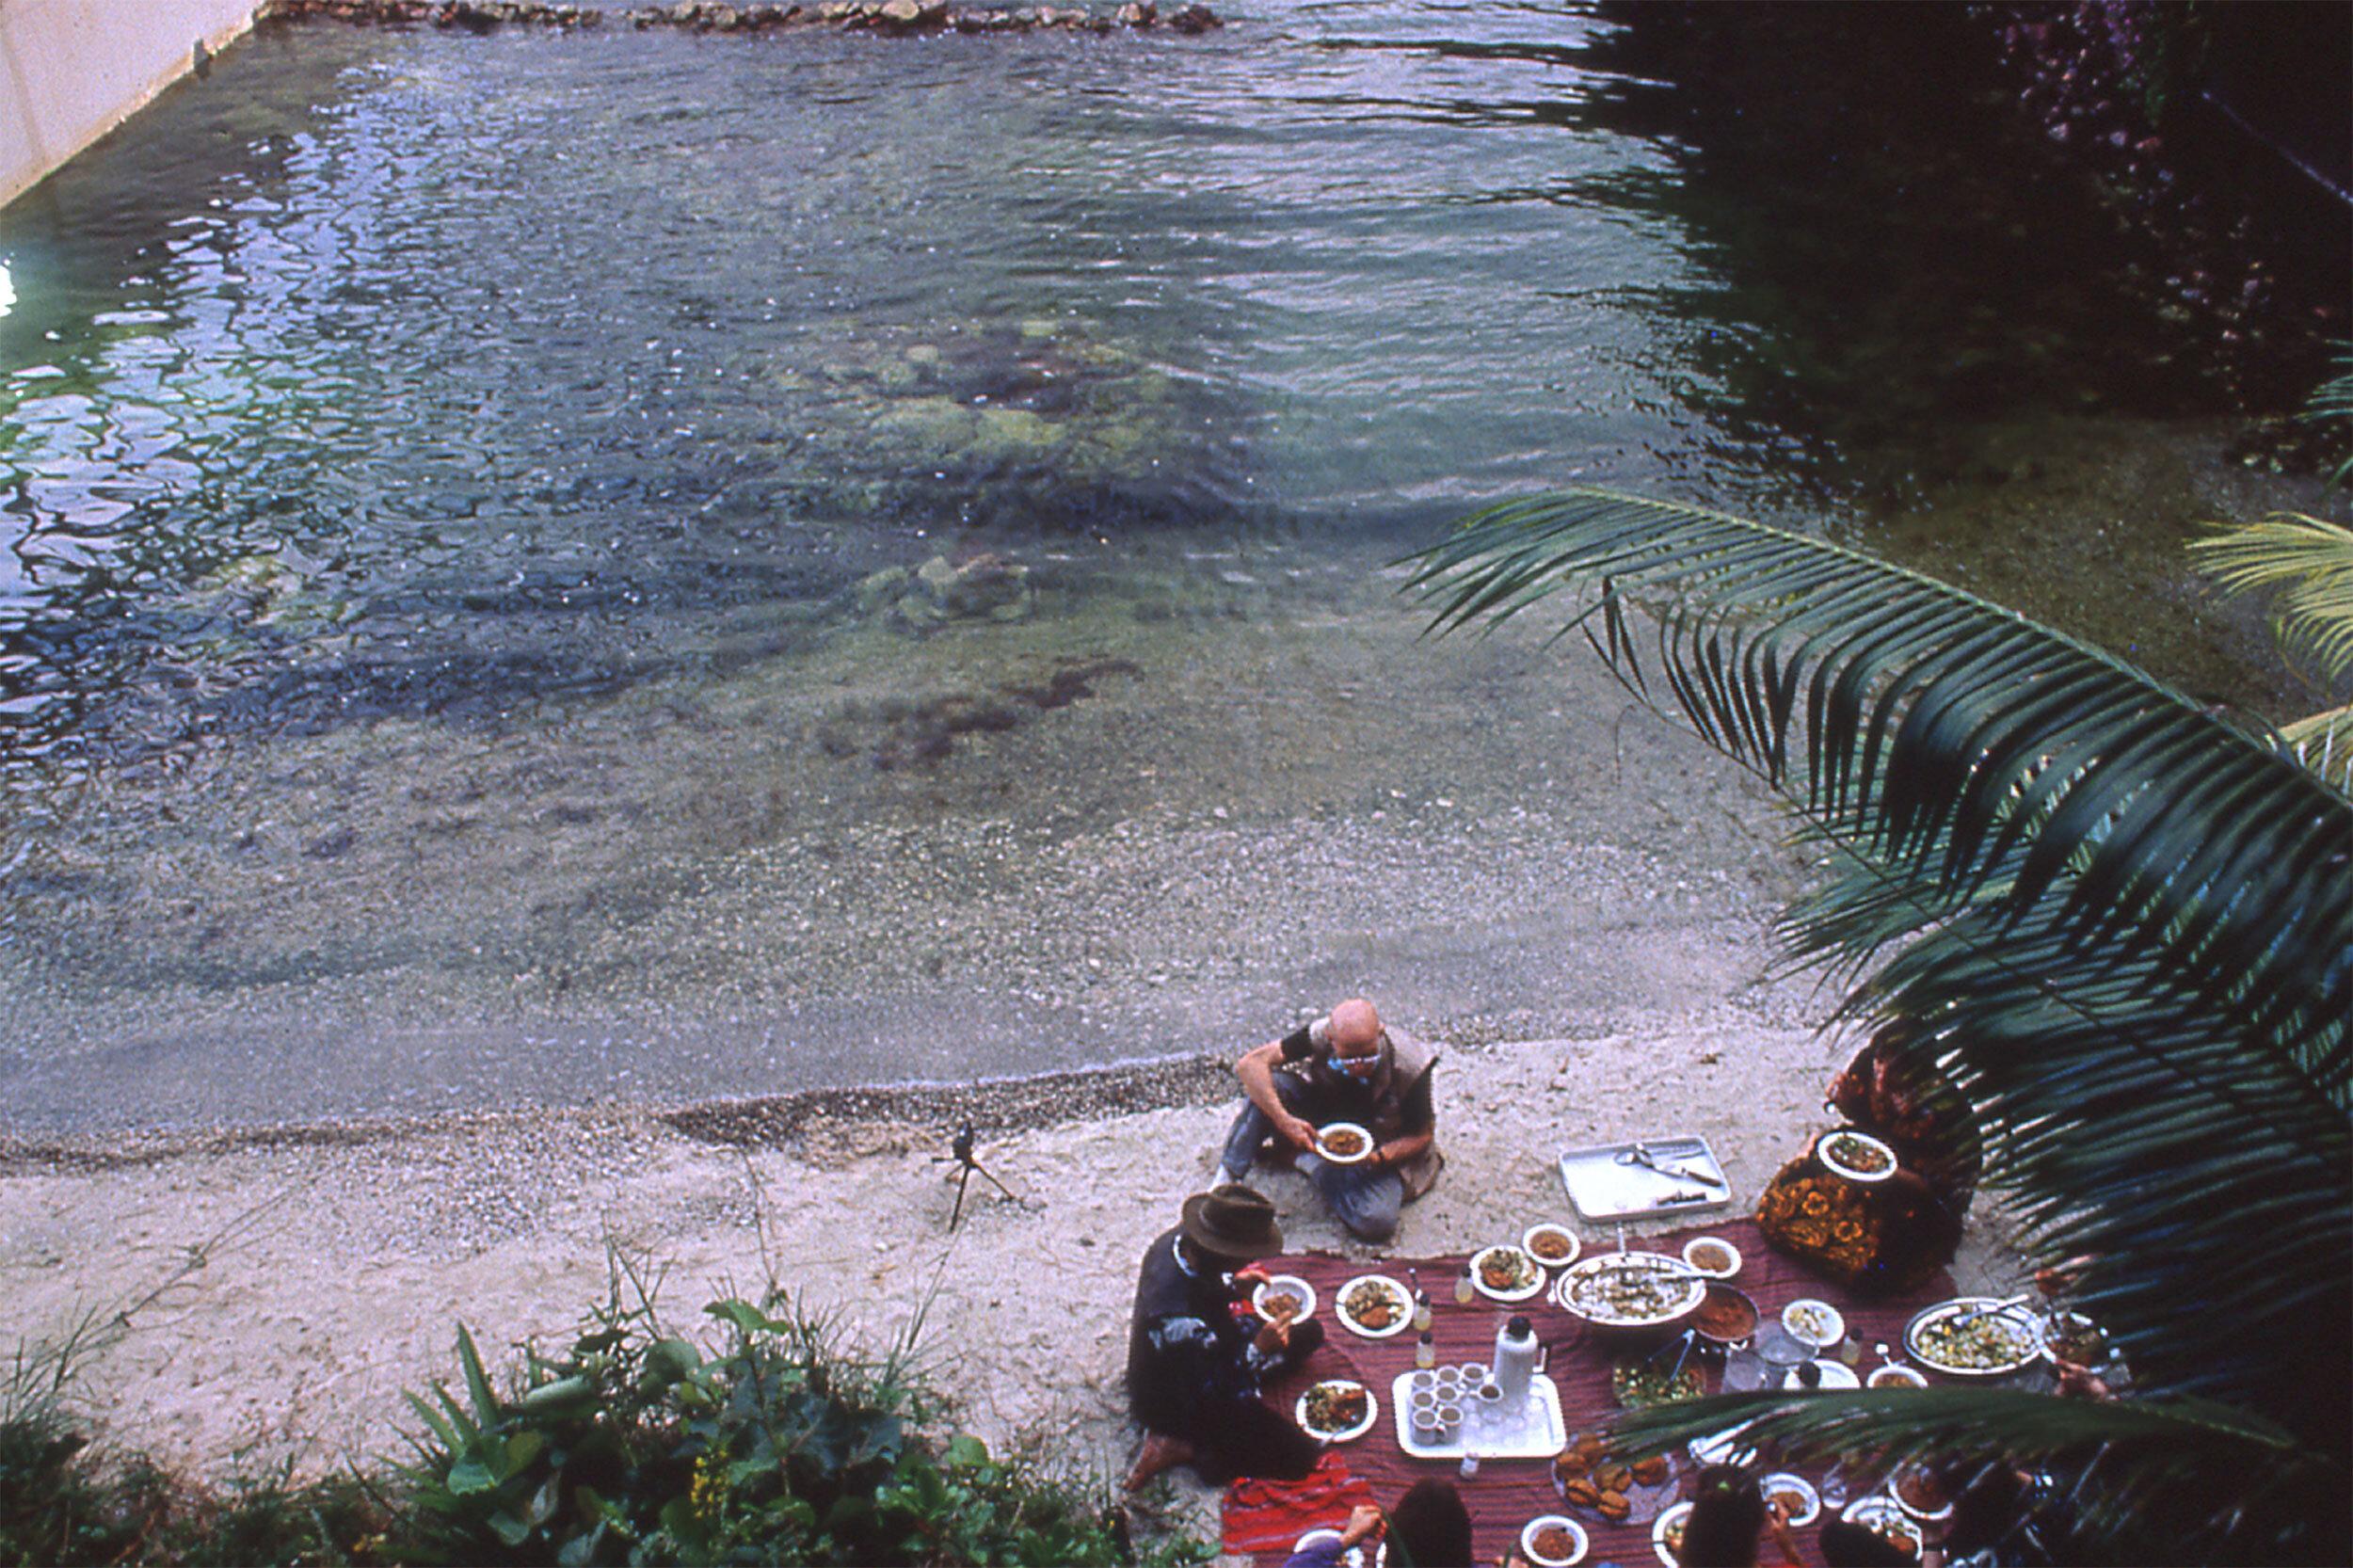 Biospherians enjoying a meal by the ocean biome